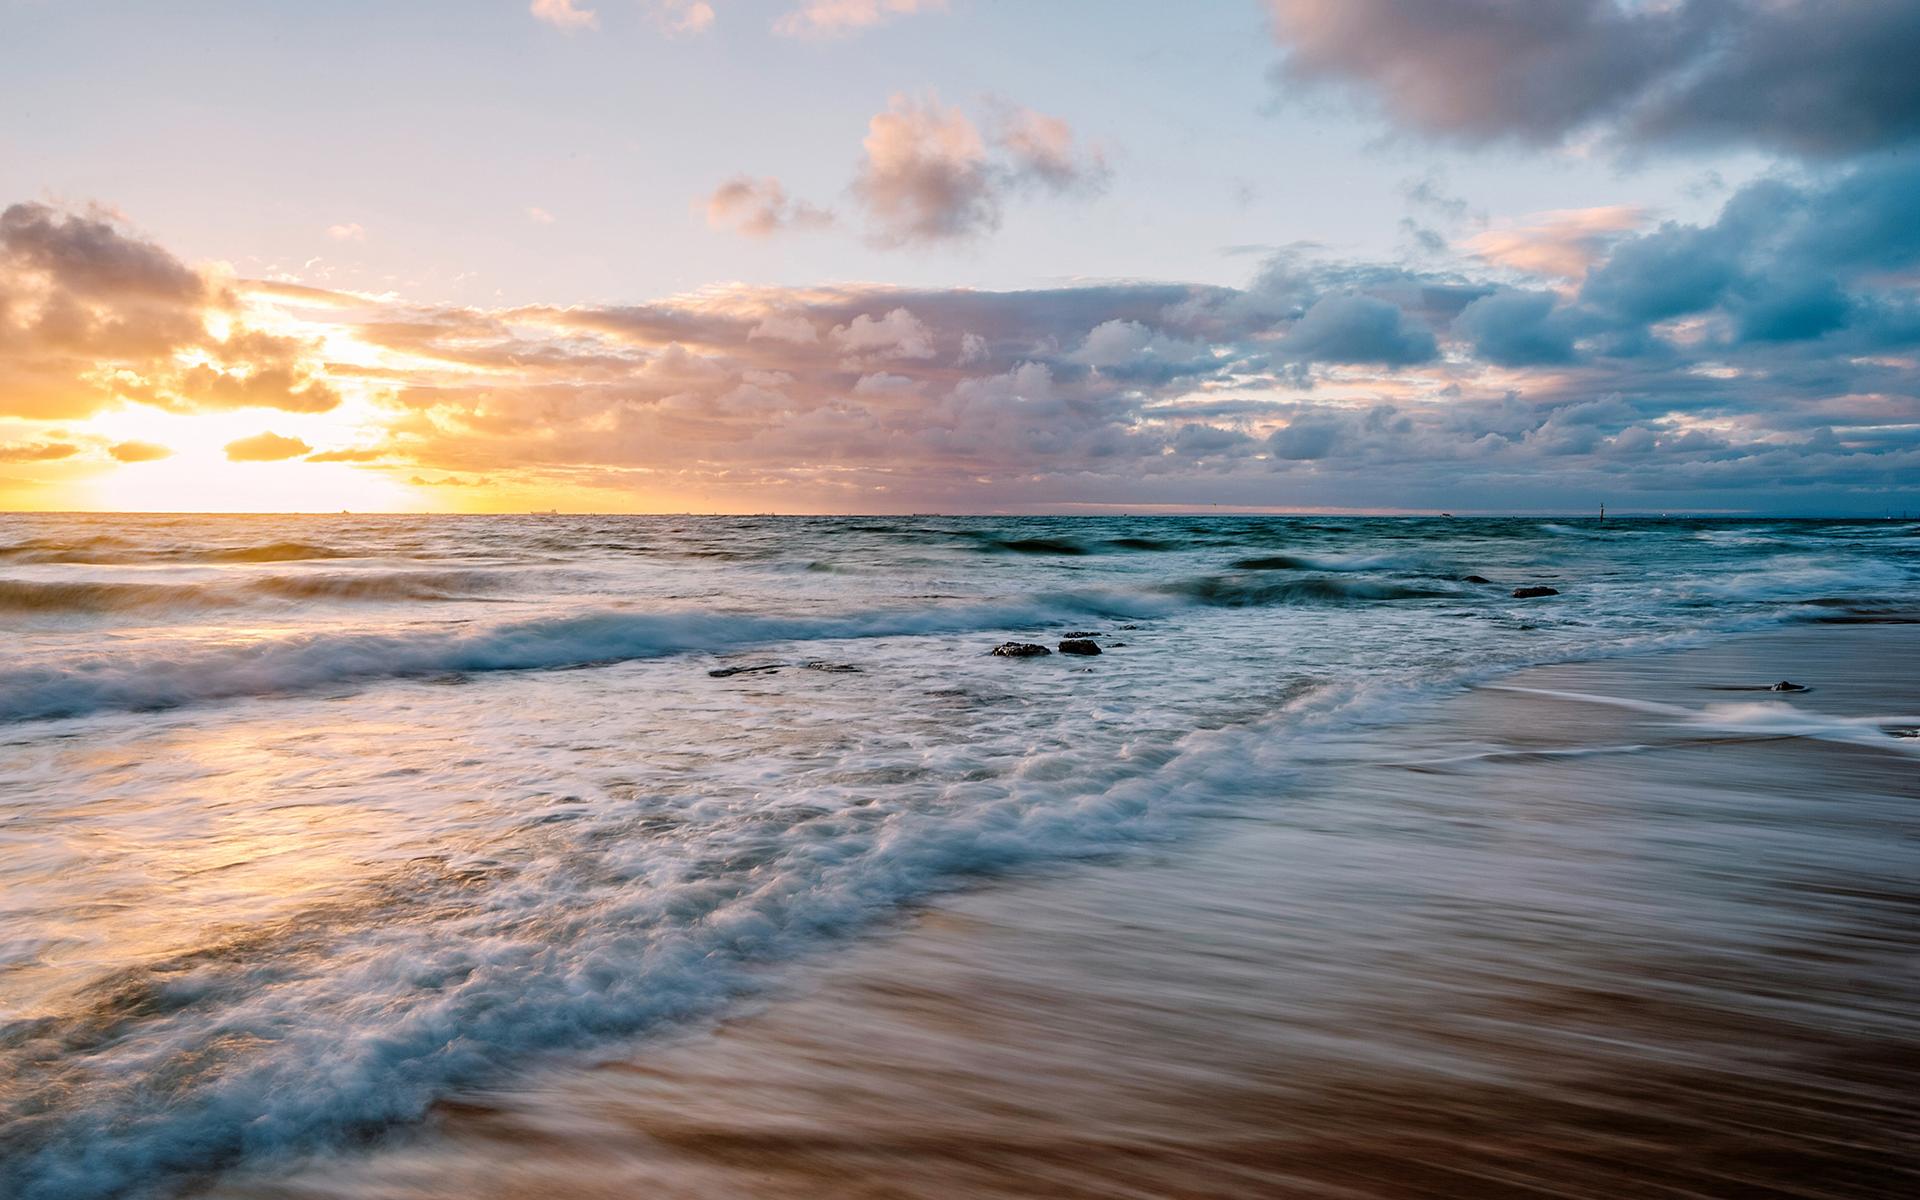 Image Result For Sunset Beach Wallpapers New Beaches Evening Sunset Rocks Sea Beach Nature Wallpapers Desktop